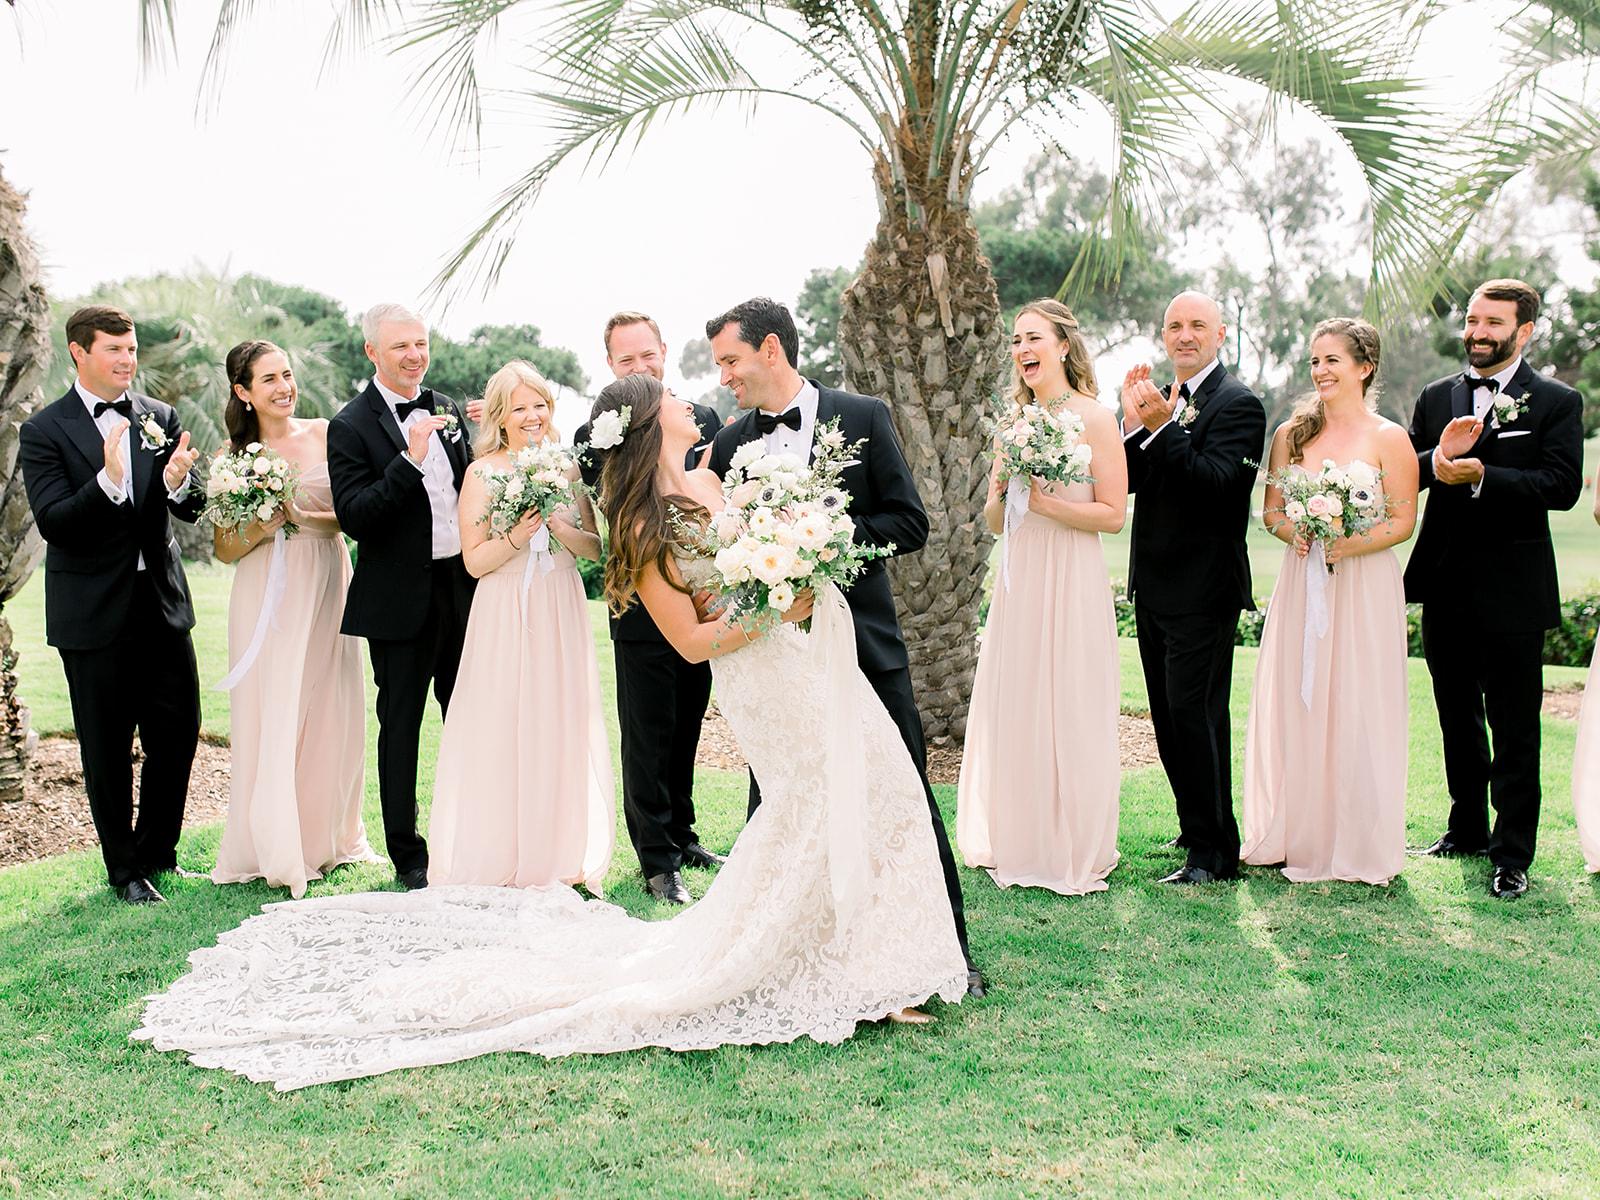 Melissa-Dave-Wedding-255.jpg